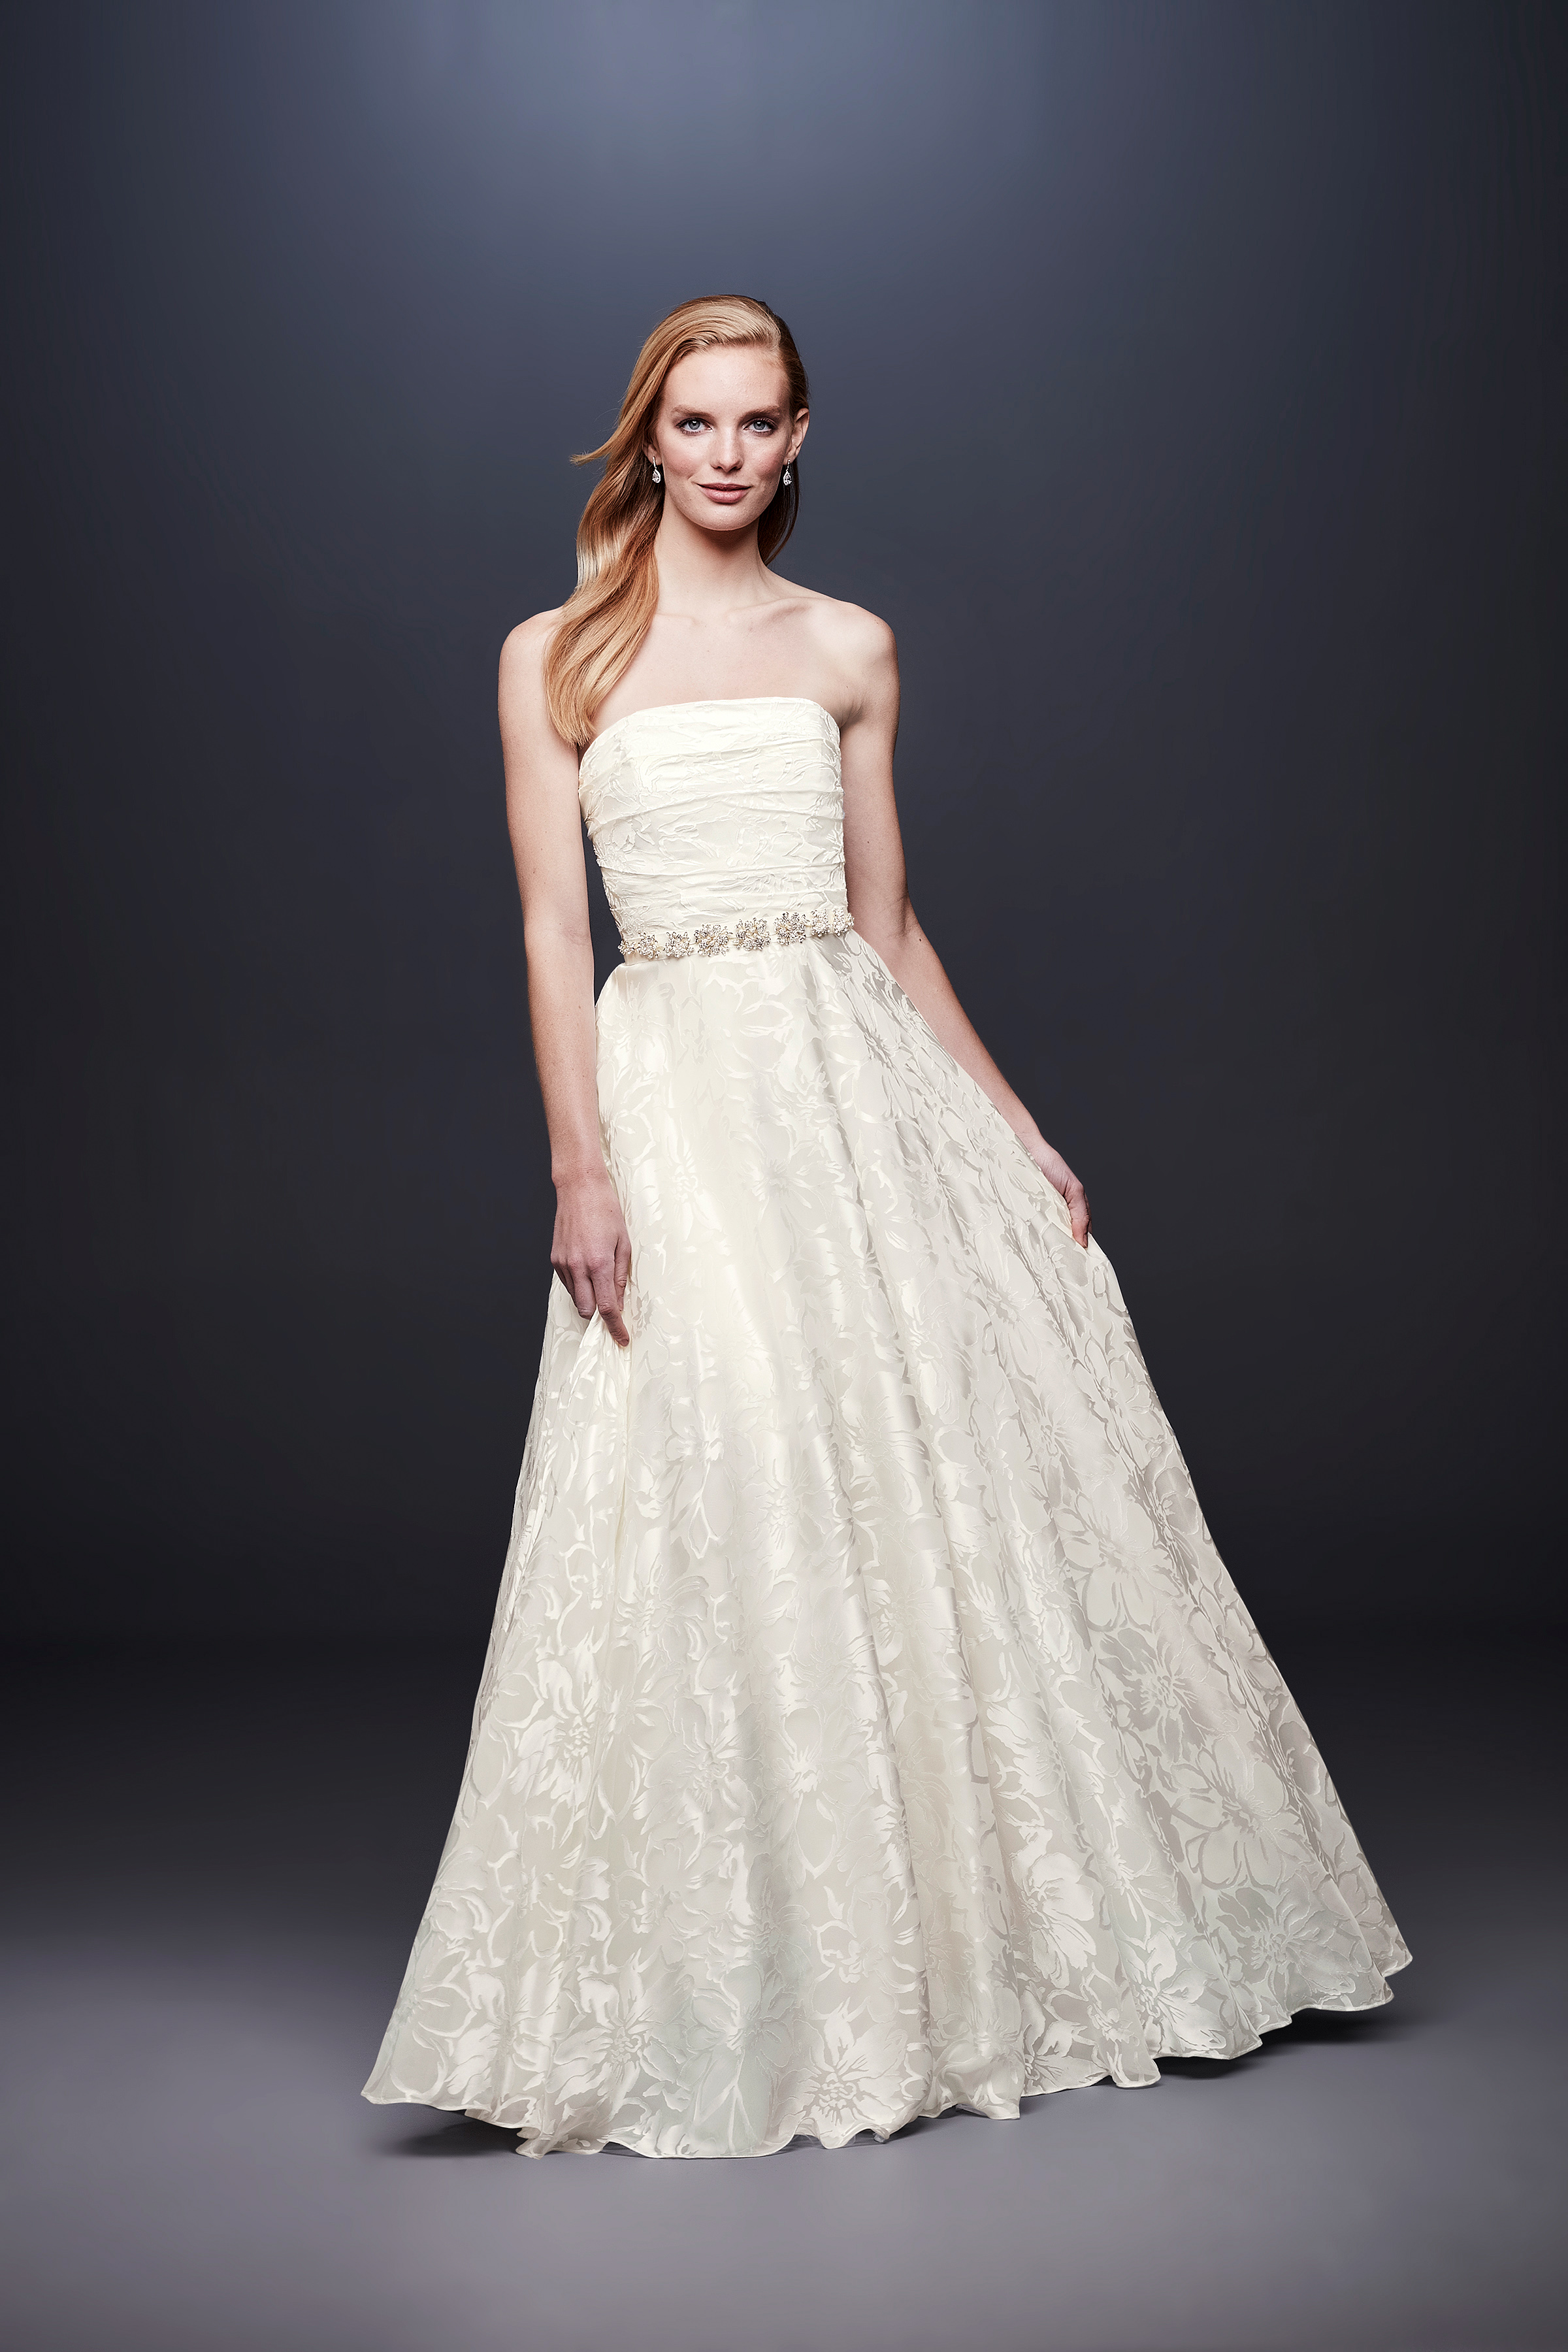 david bridal wedding dress spring 2019 strapless patterned beaded belt